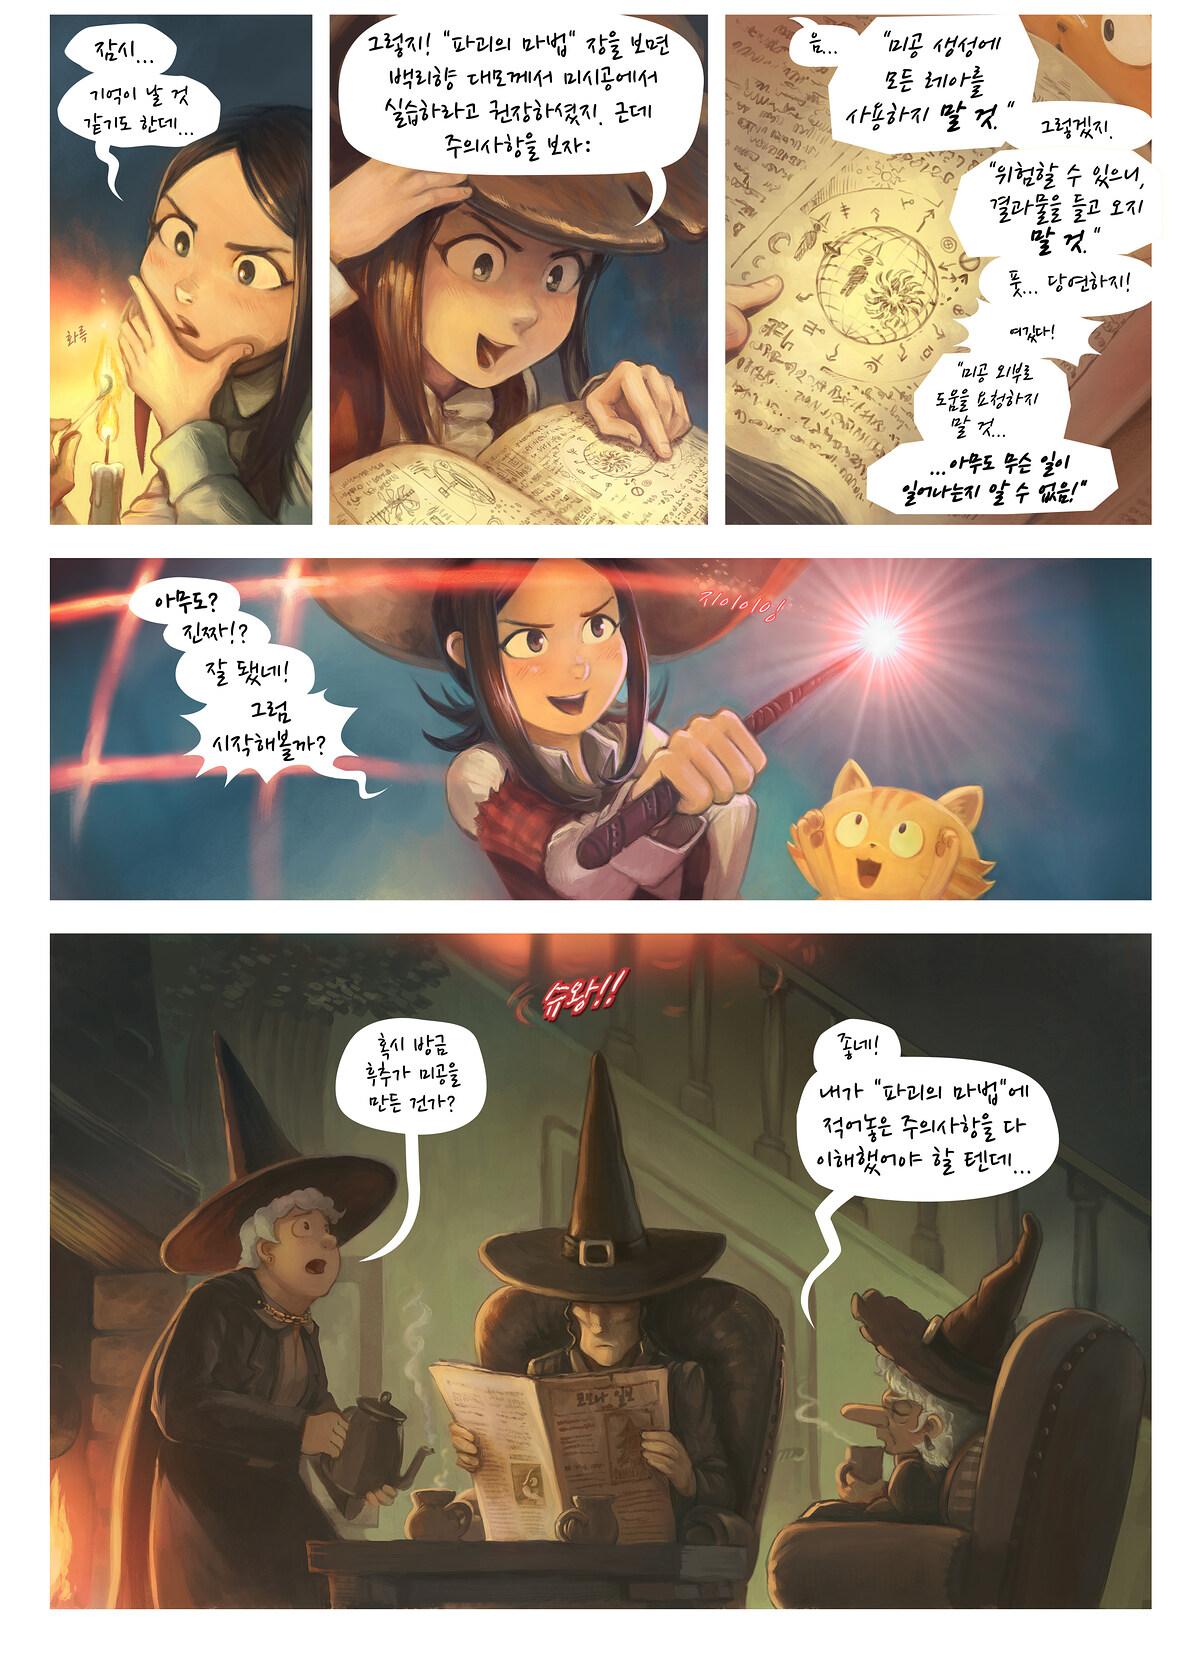 A webcomic page of Pepper&Carrot, 에피소드 24 [kr], 페이지 3